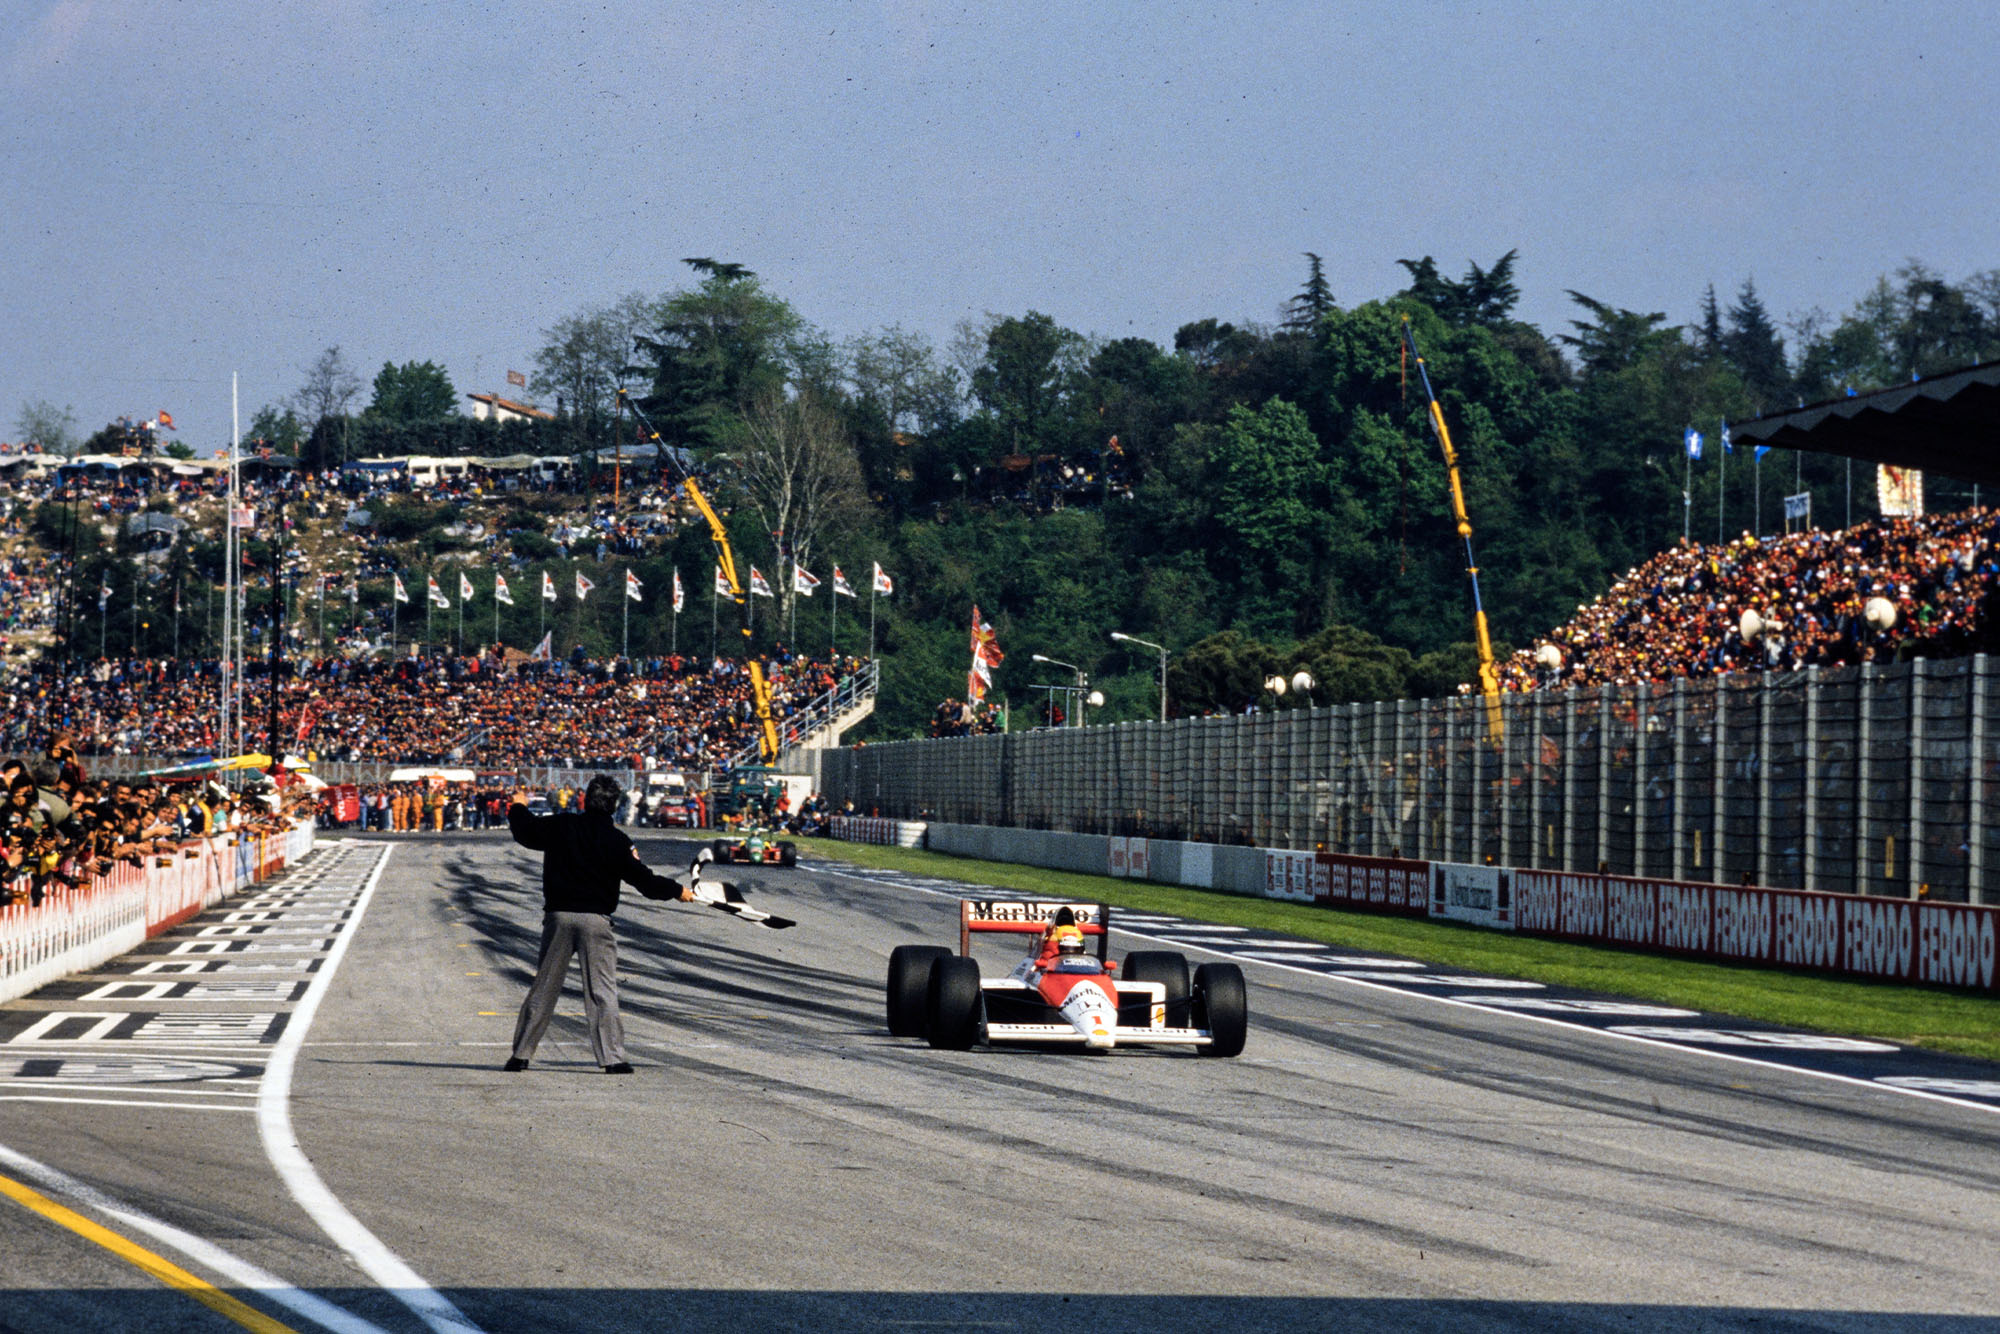 1989 San Marino GP Senna finish